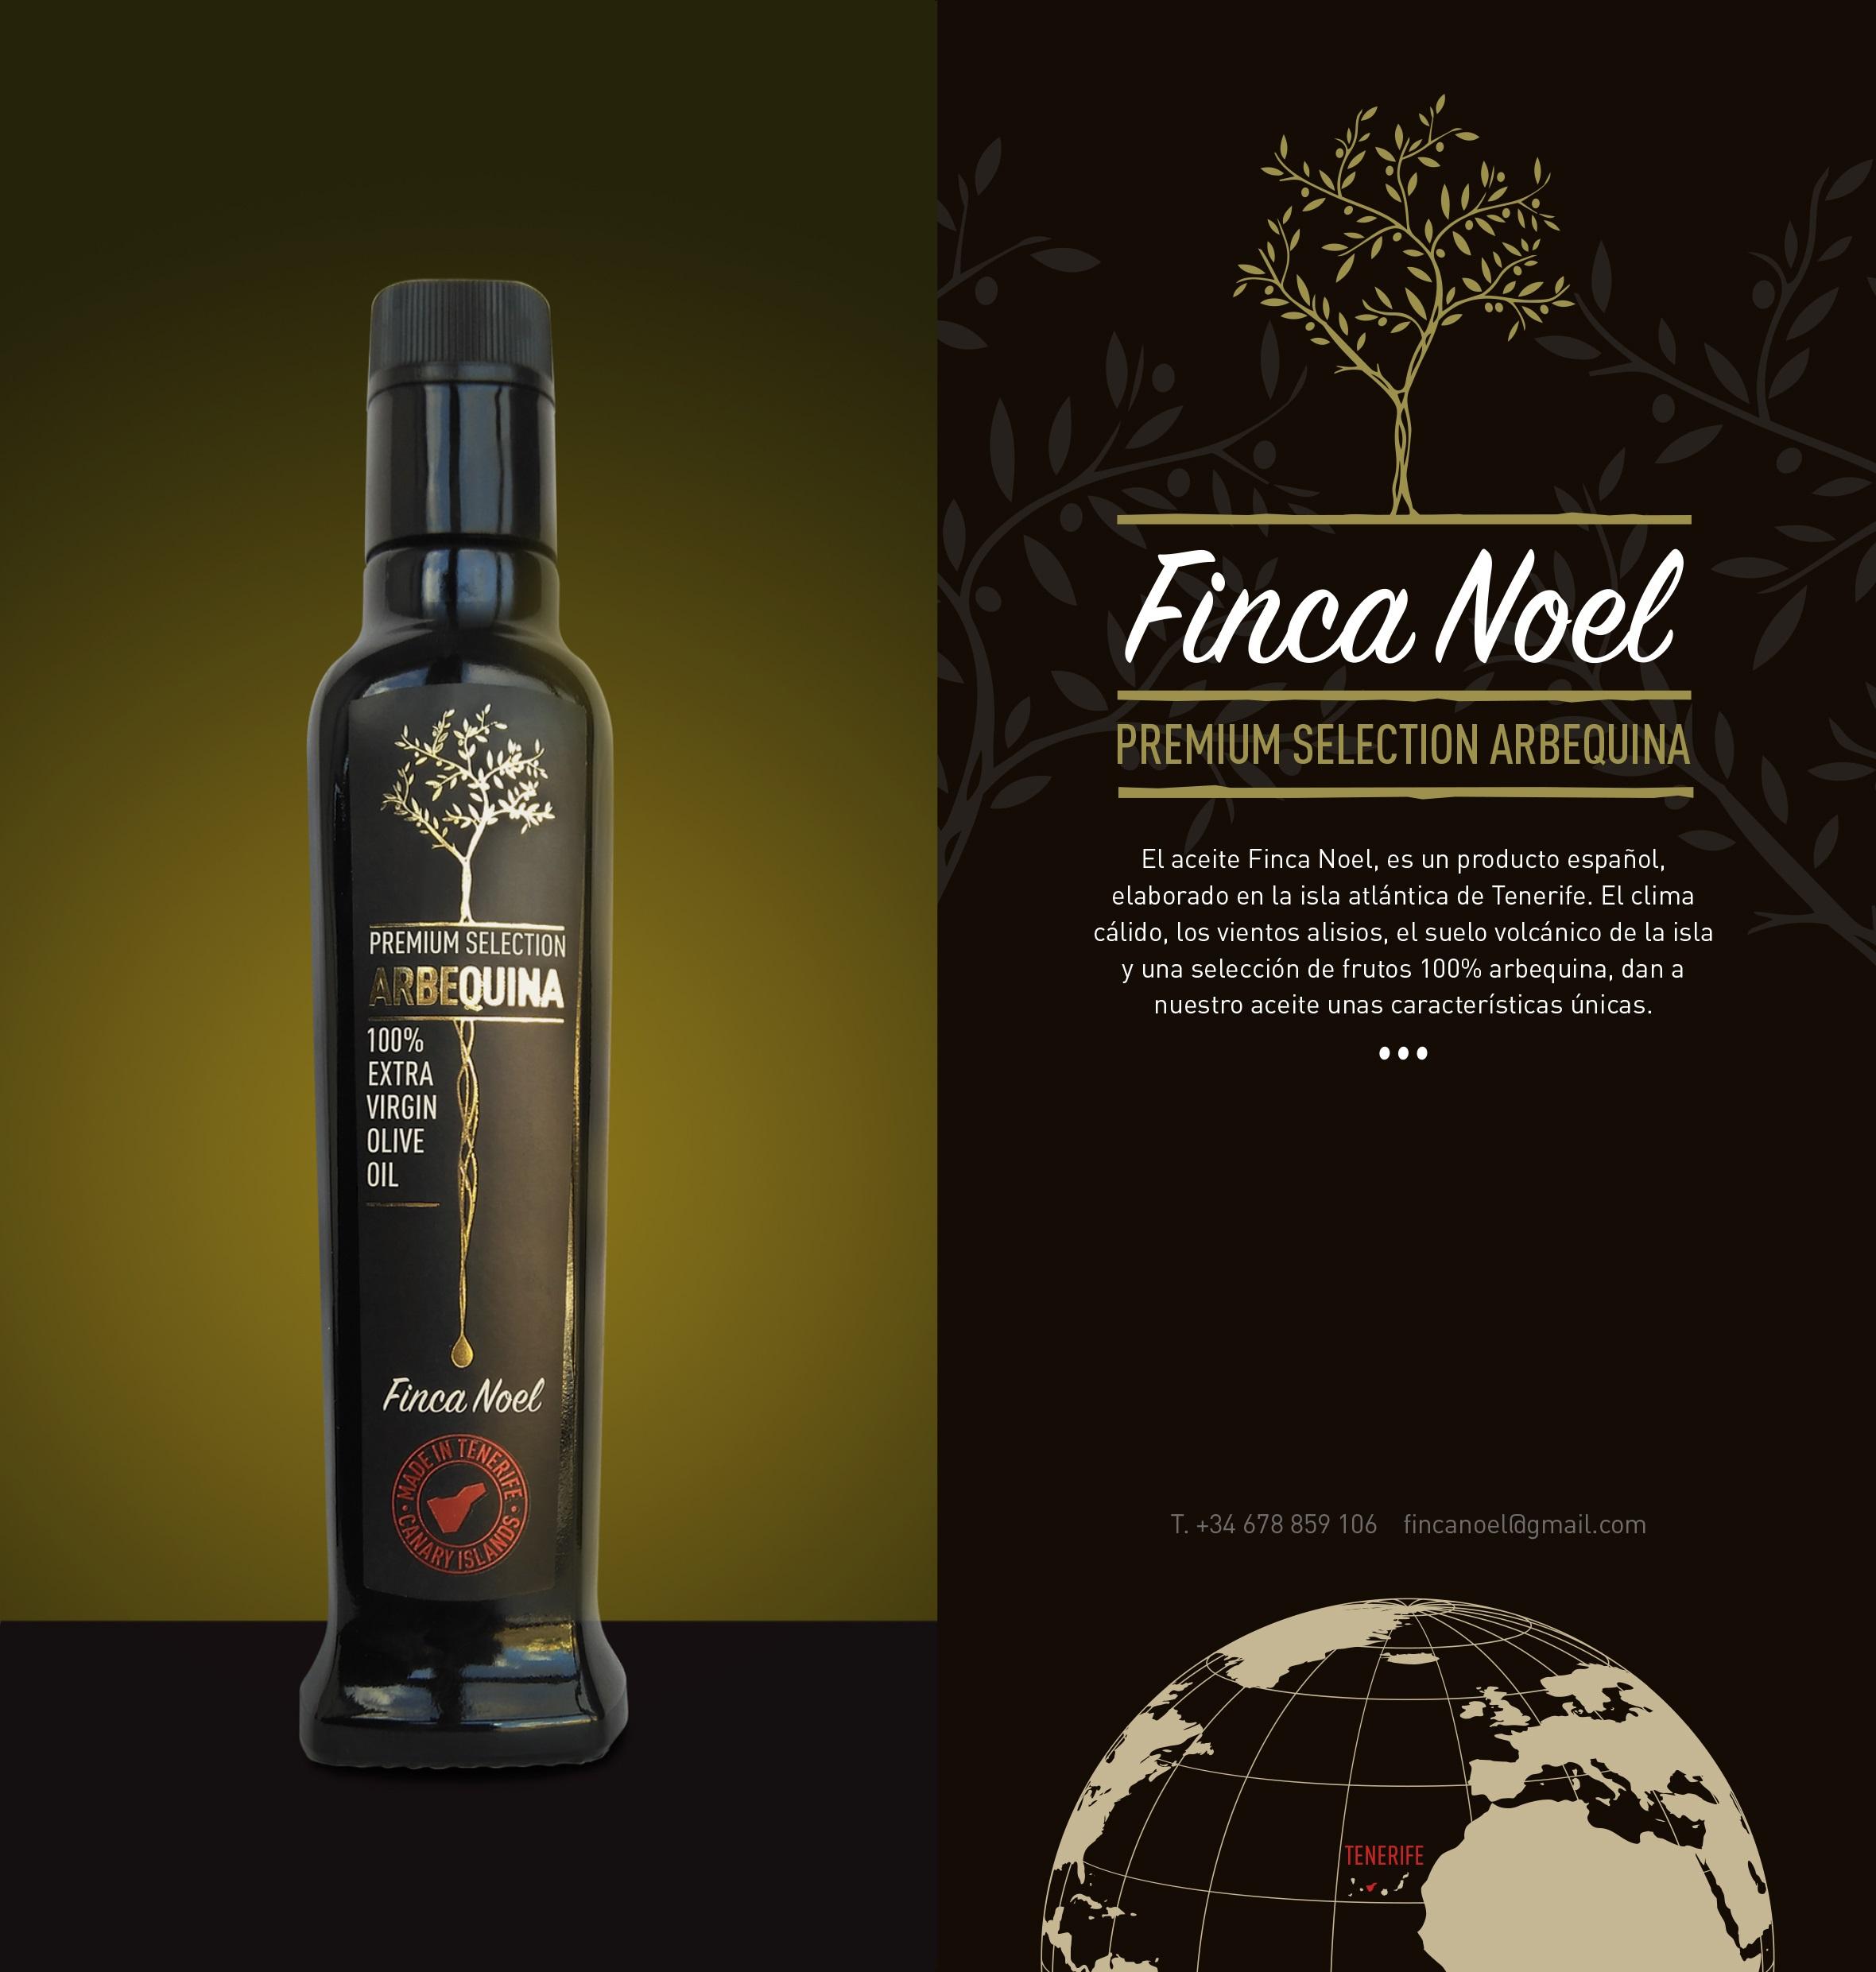 Finca Noel, Aceite de Oliva Virgen Extra Premium Arbequina, una marca ecológica de la isla de Tenerife